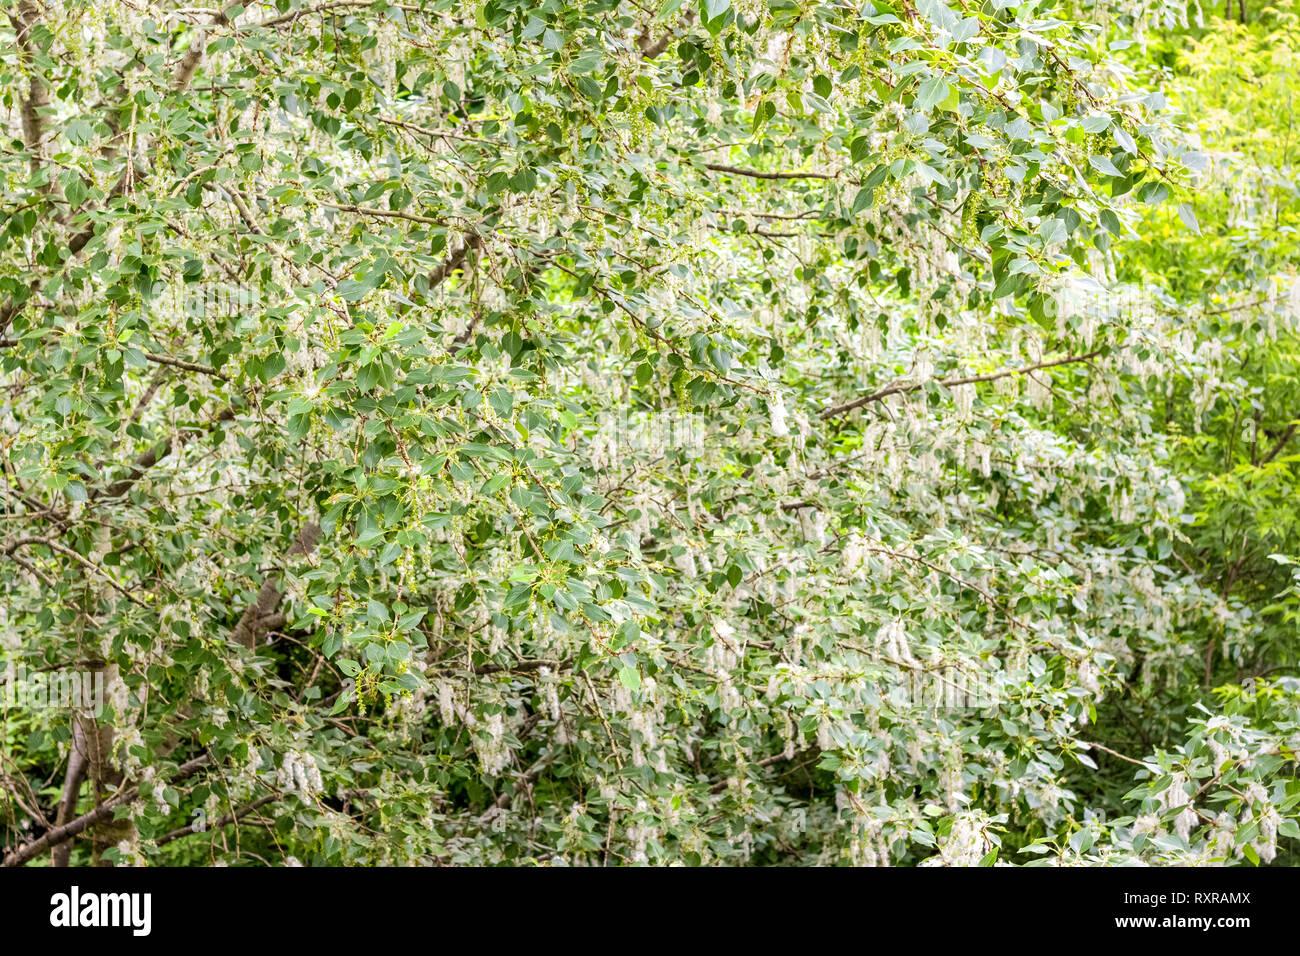 Poplar fluff on the tree - Stock Image